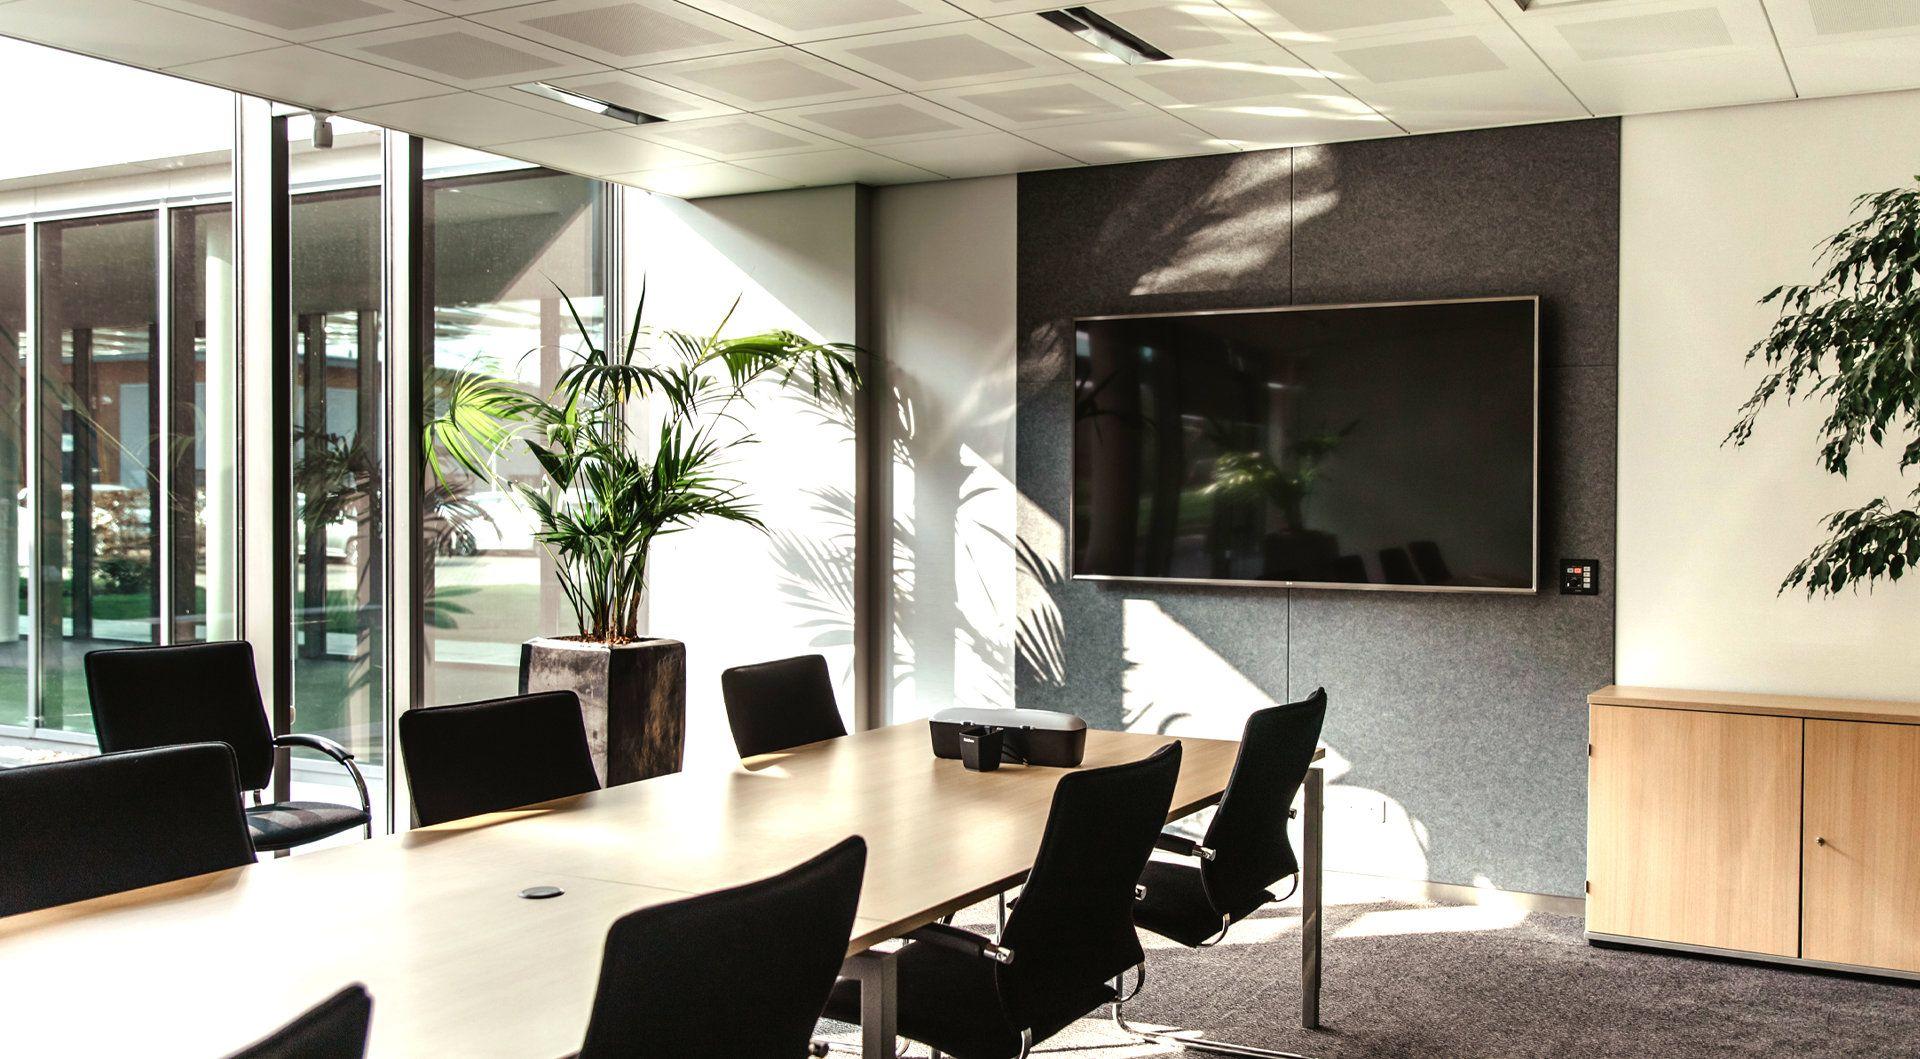 "Dekker Industrial Design DID010.006.010-02 flat panel vloer standaard 81,3 cm (32"") Vaste flatscreen vloerstandaard Wit - Case studie de vries"